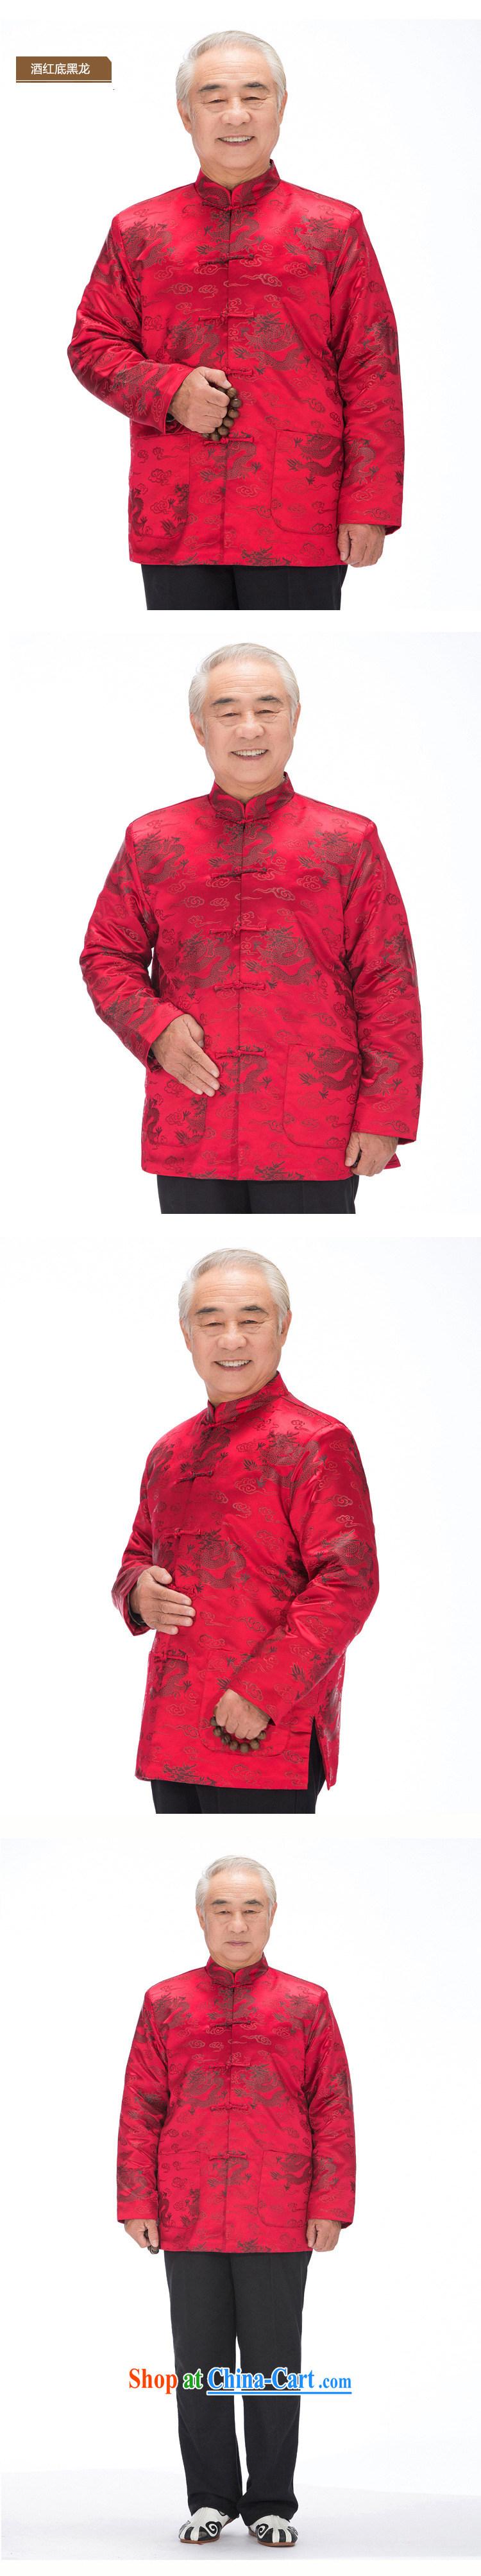 light at the men's long-sleeved jacket Chinese parka brigades